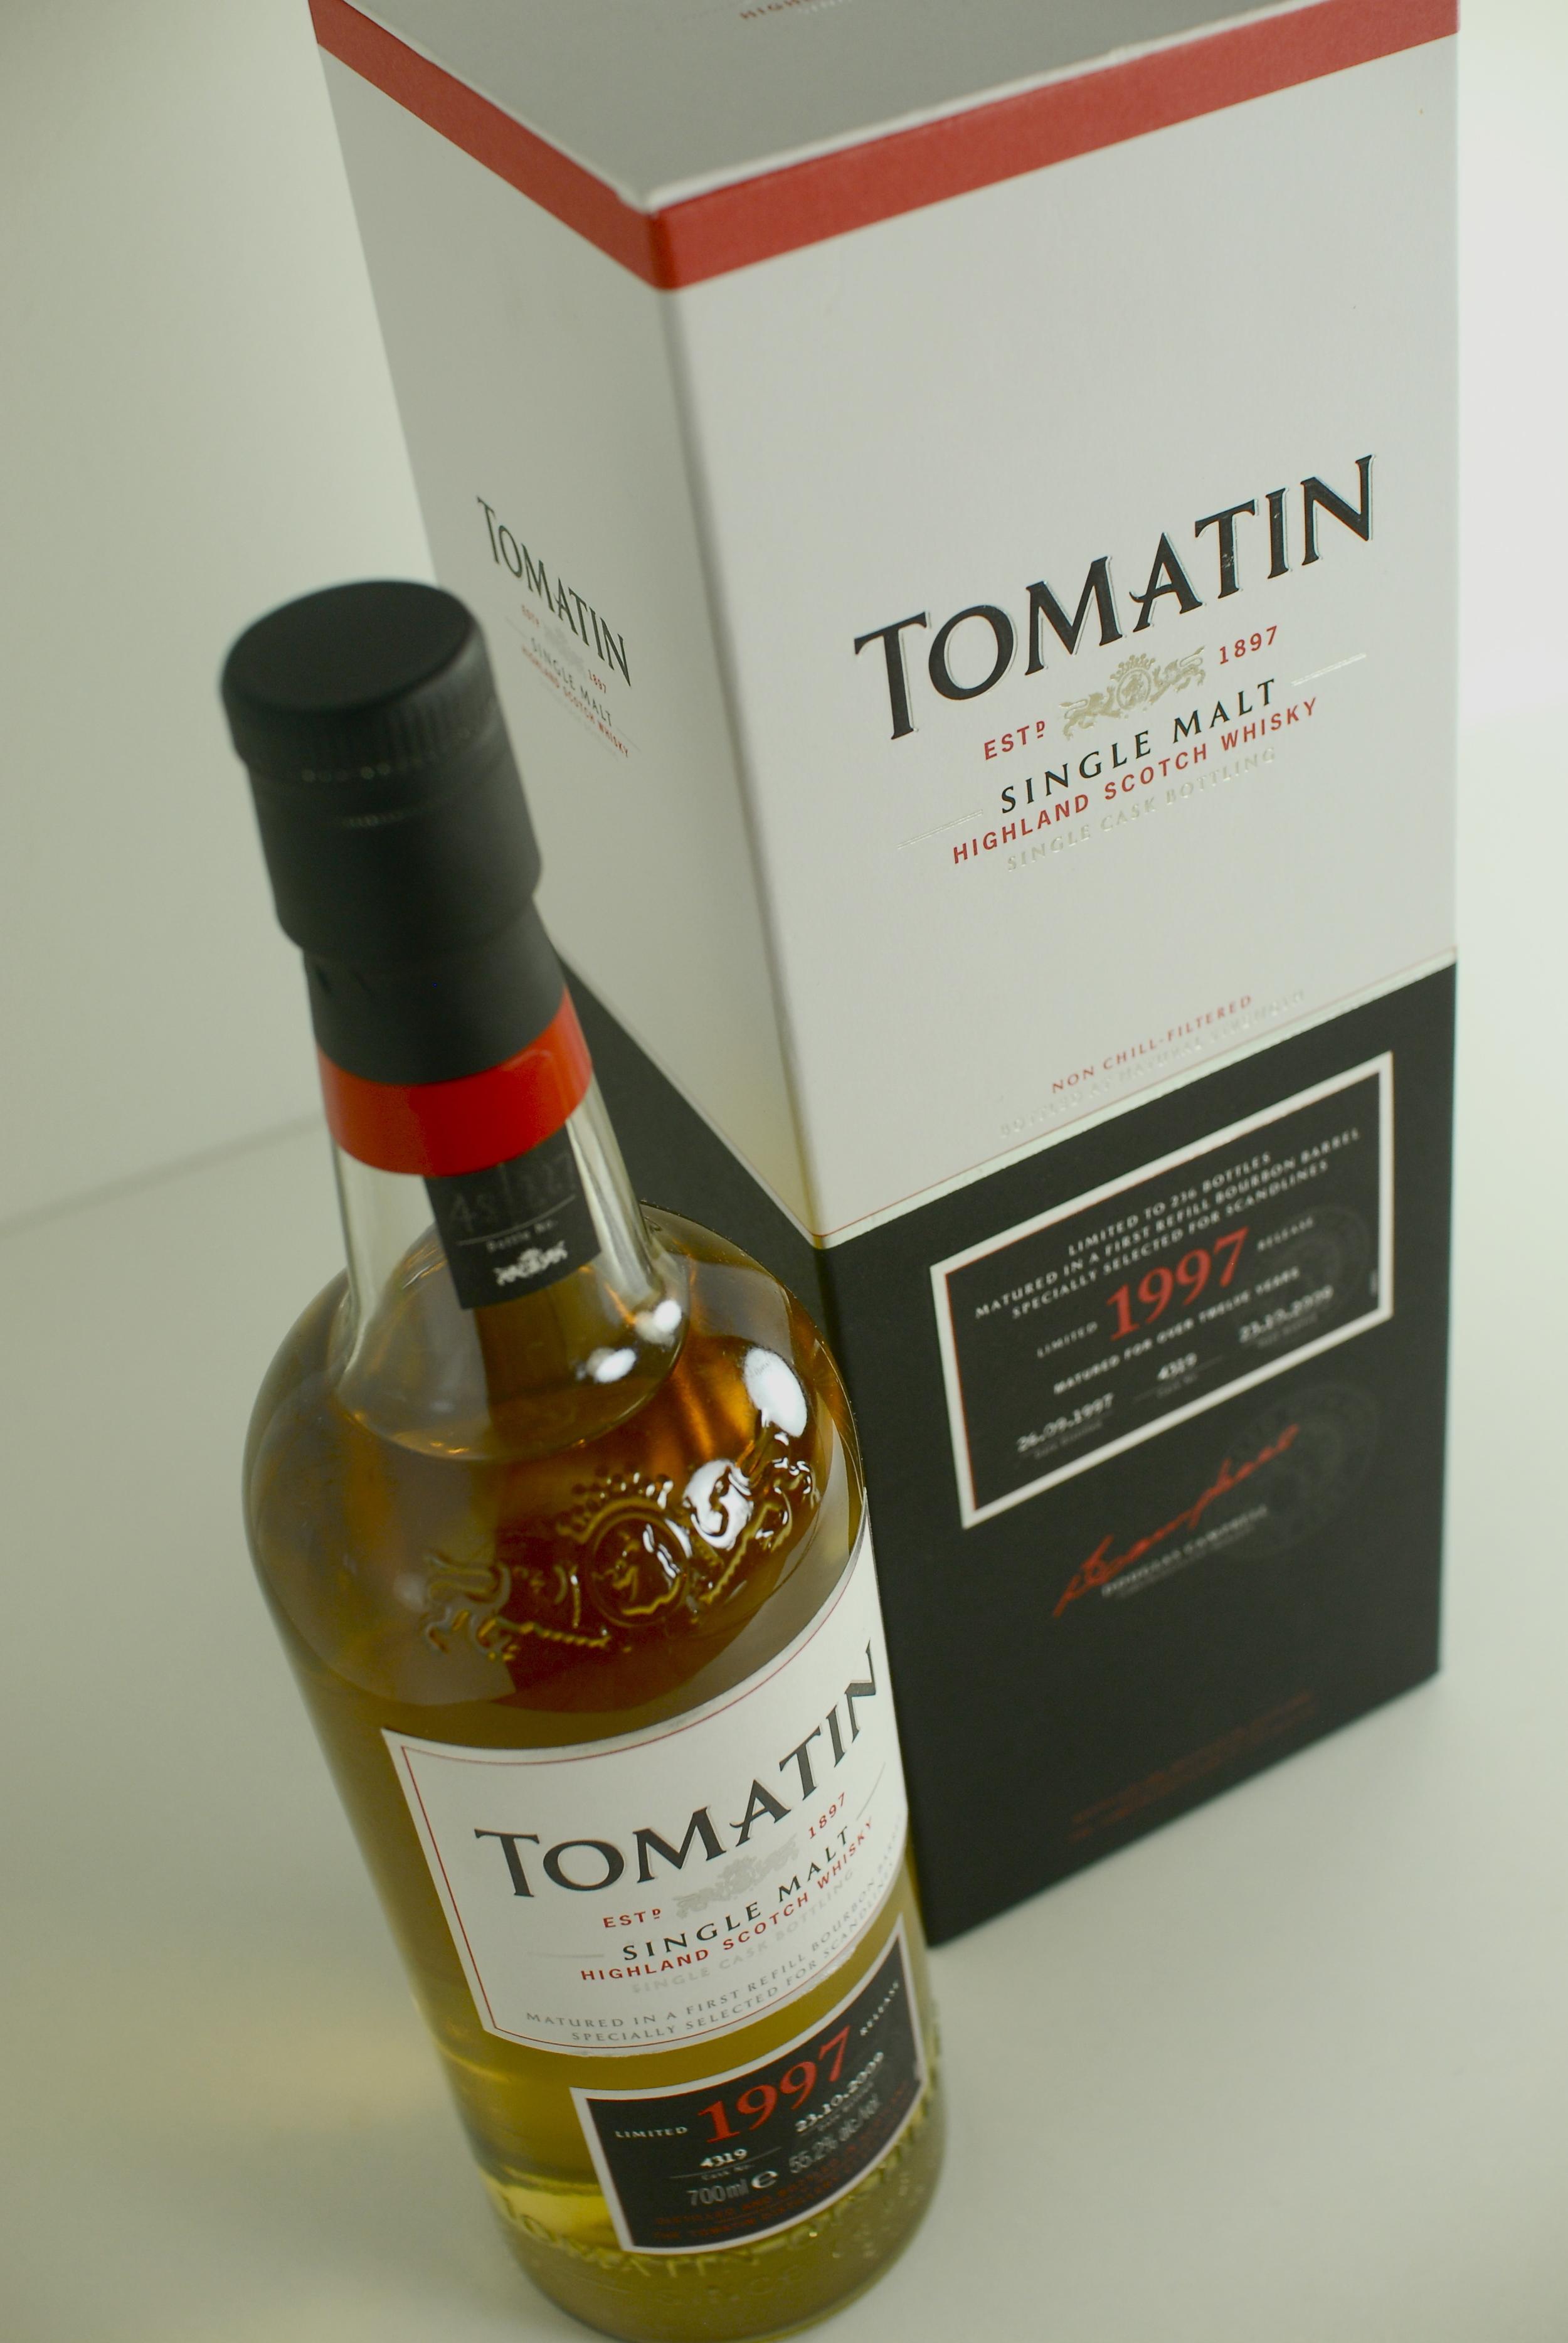 tomatin 1997